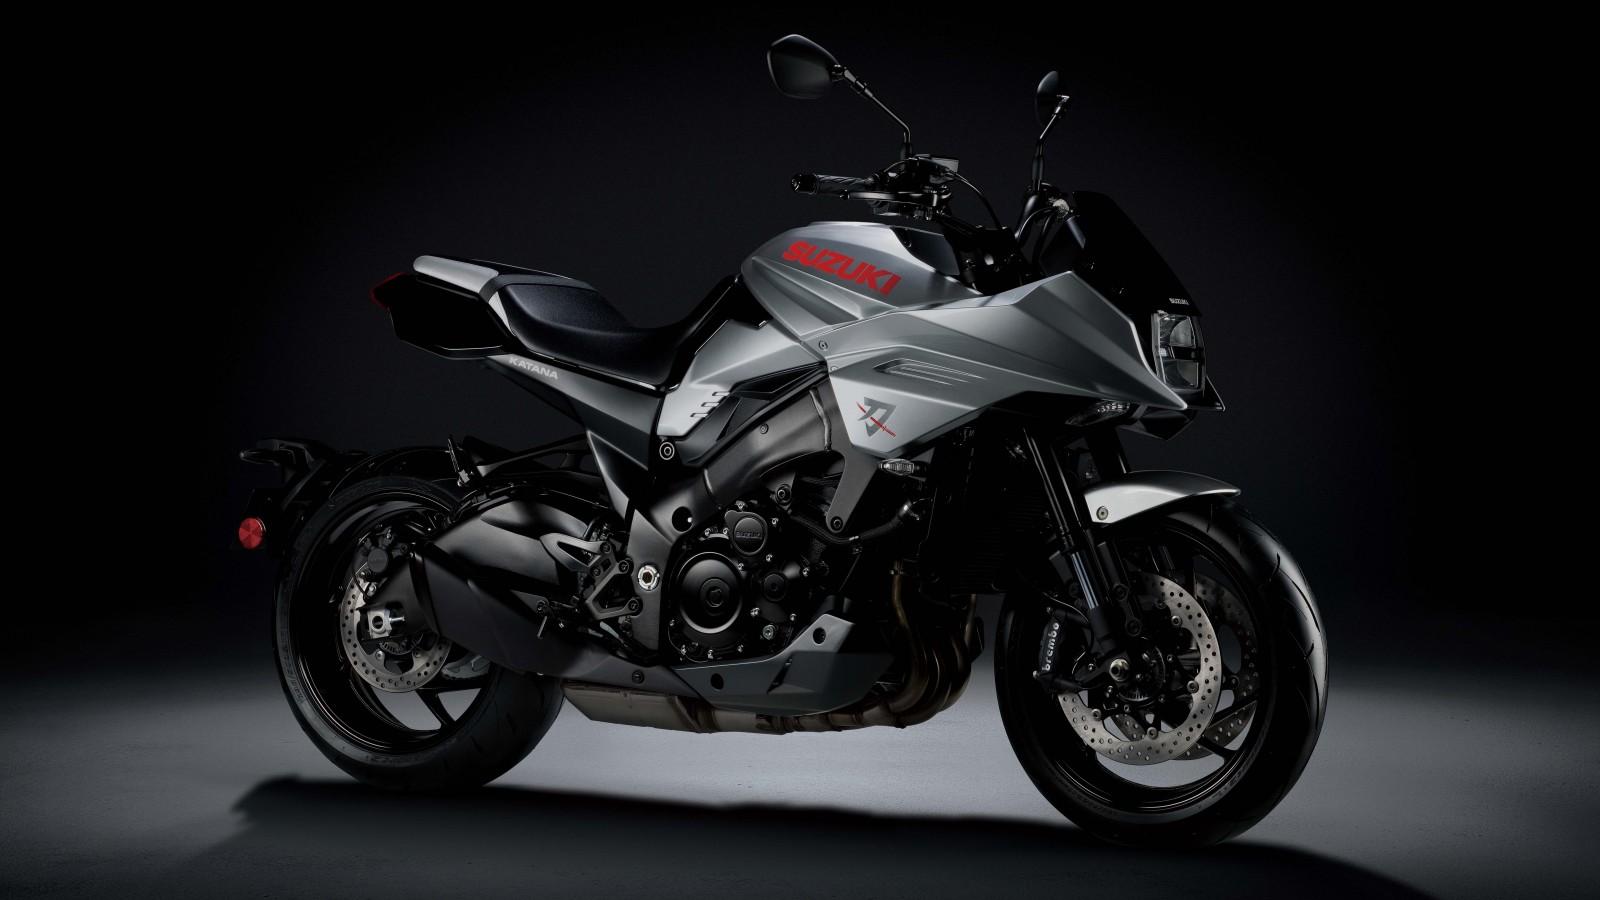 3d Yamaha Motorcycle Wallpaper 2020 Suzuki Katana 4k 8k Wallpapers Hd Wallpapers Id